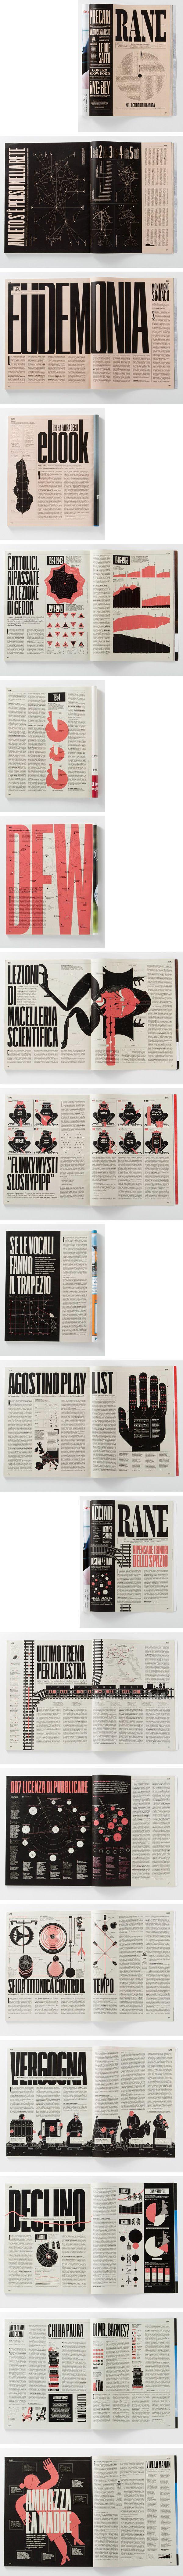 Magazine Inspiration -colours and type (RANE)